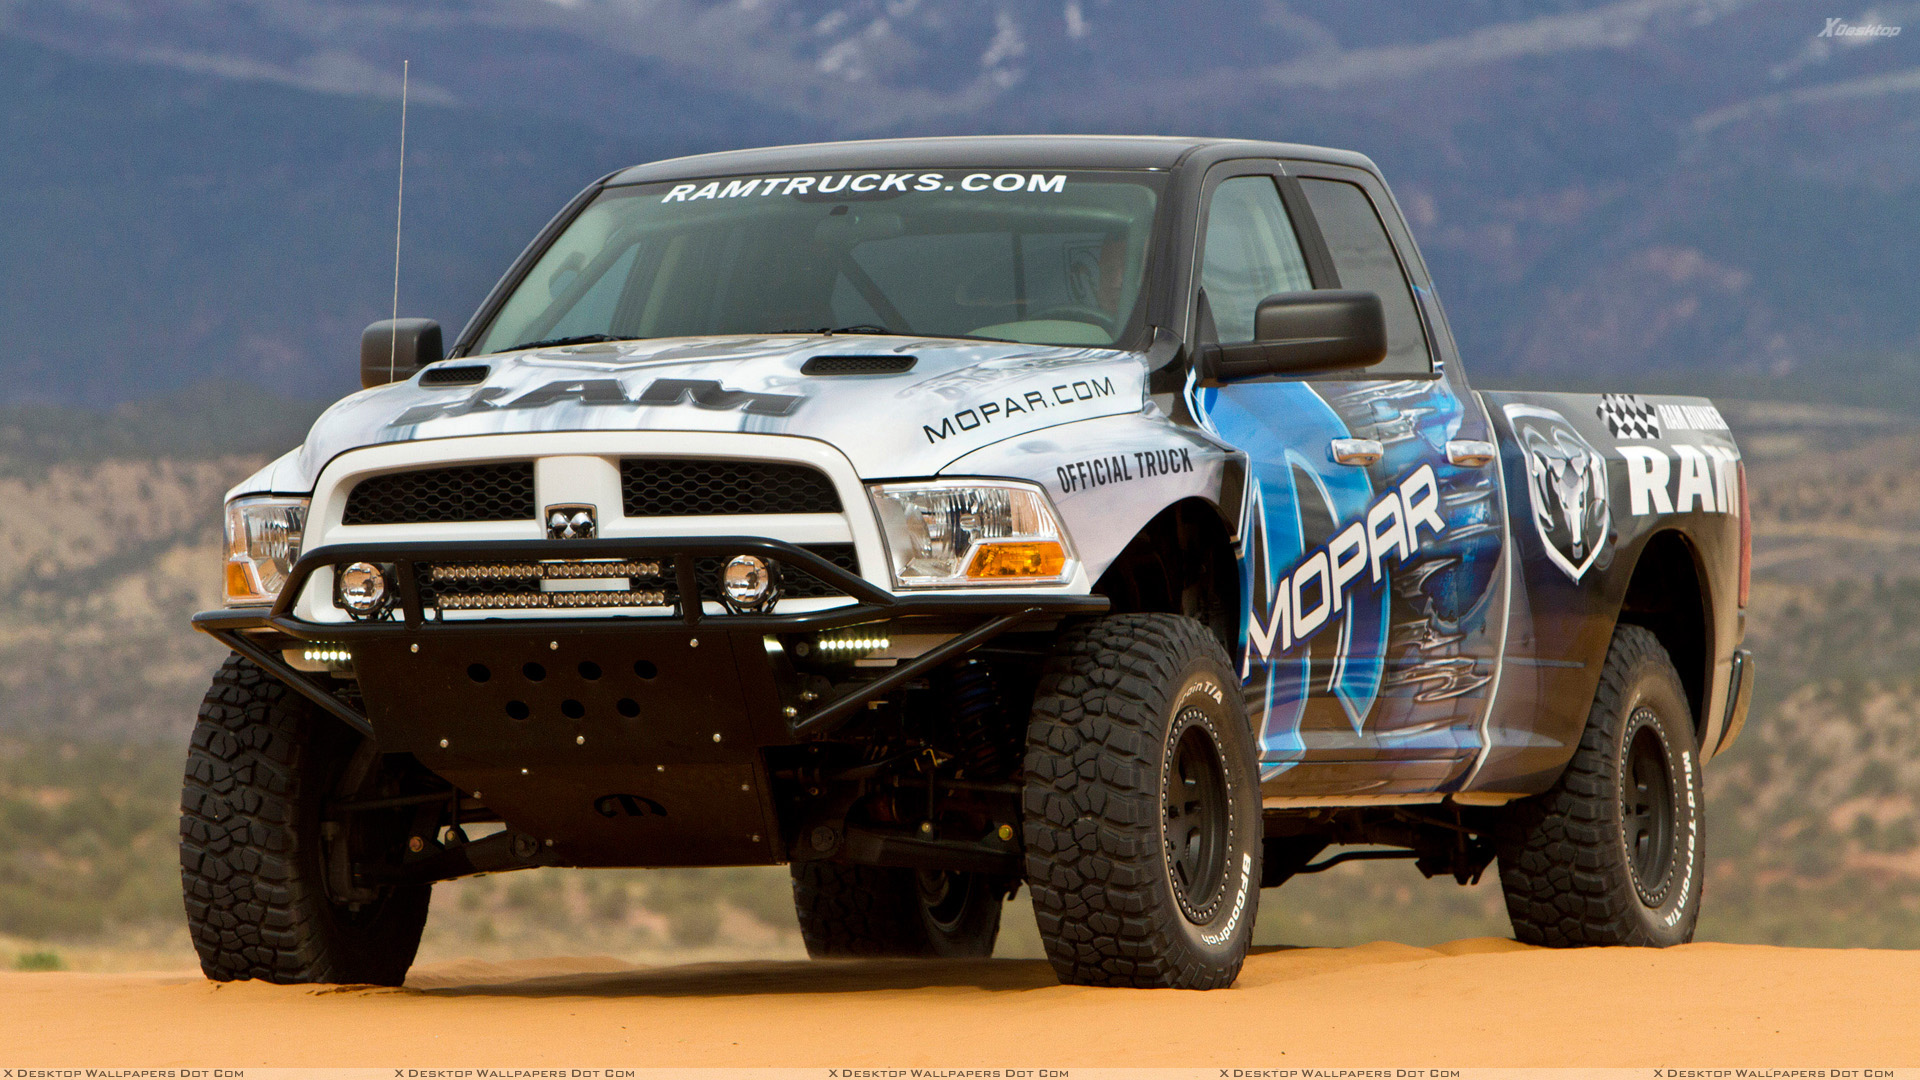 2011 Dodge Ram Runner Mopar Front Pose Wallpaper 1920x1080